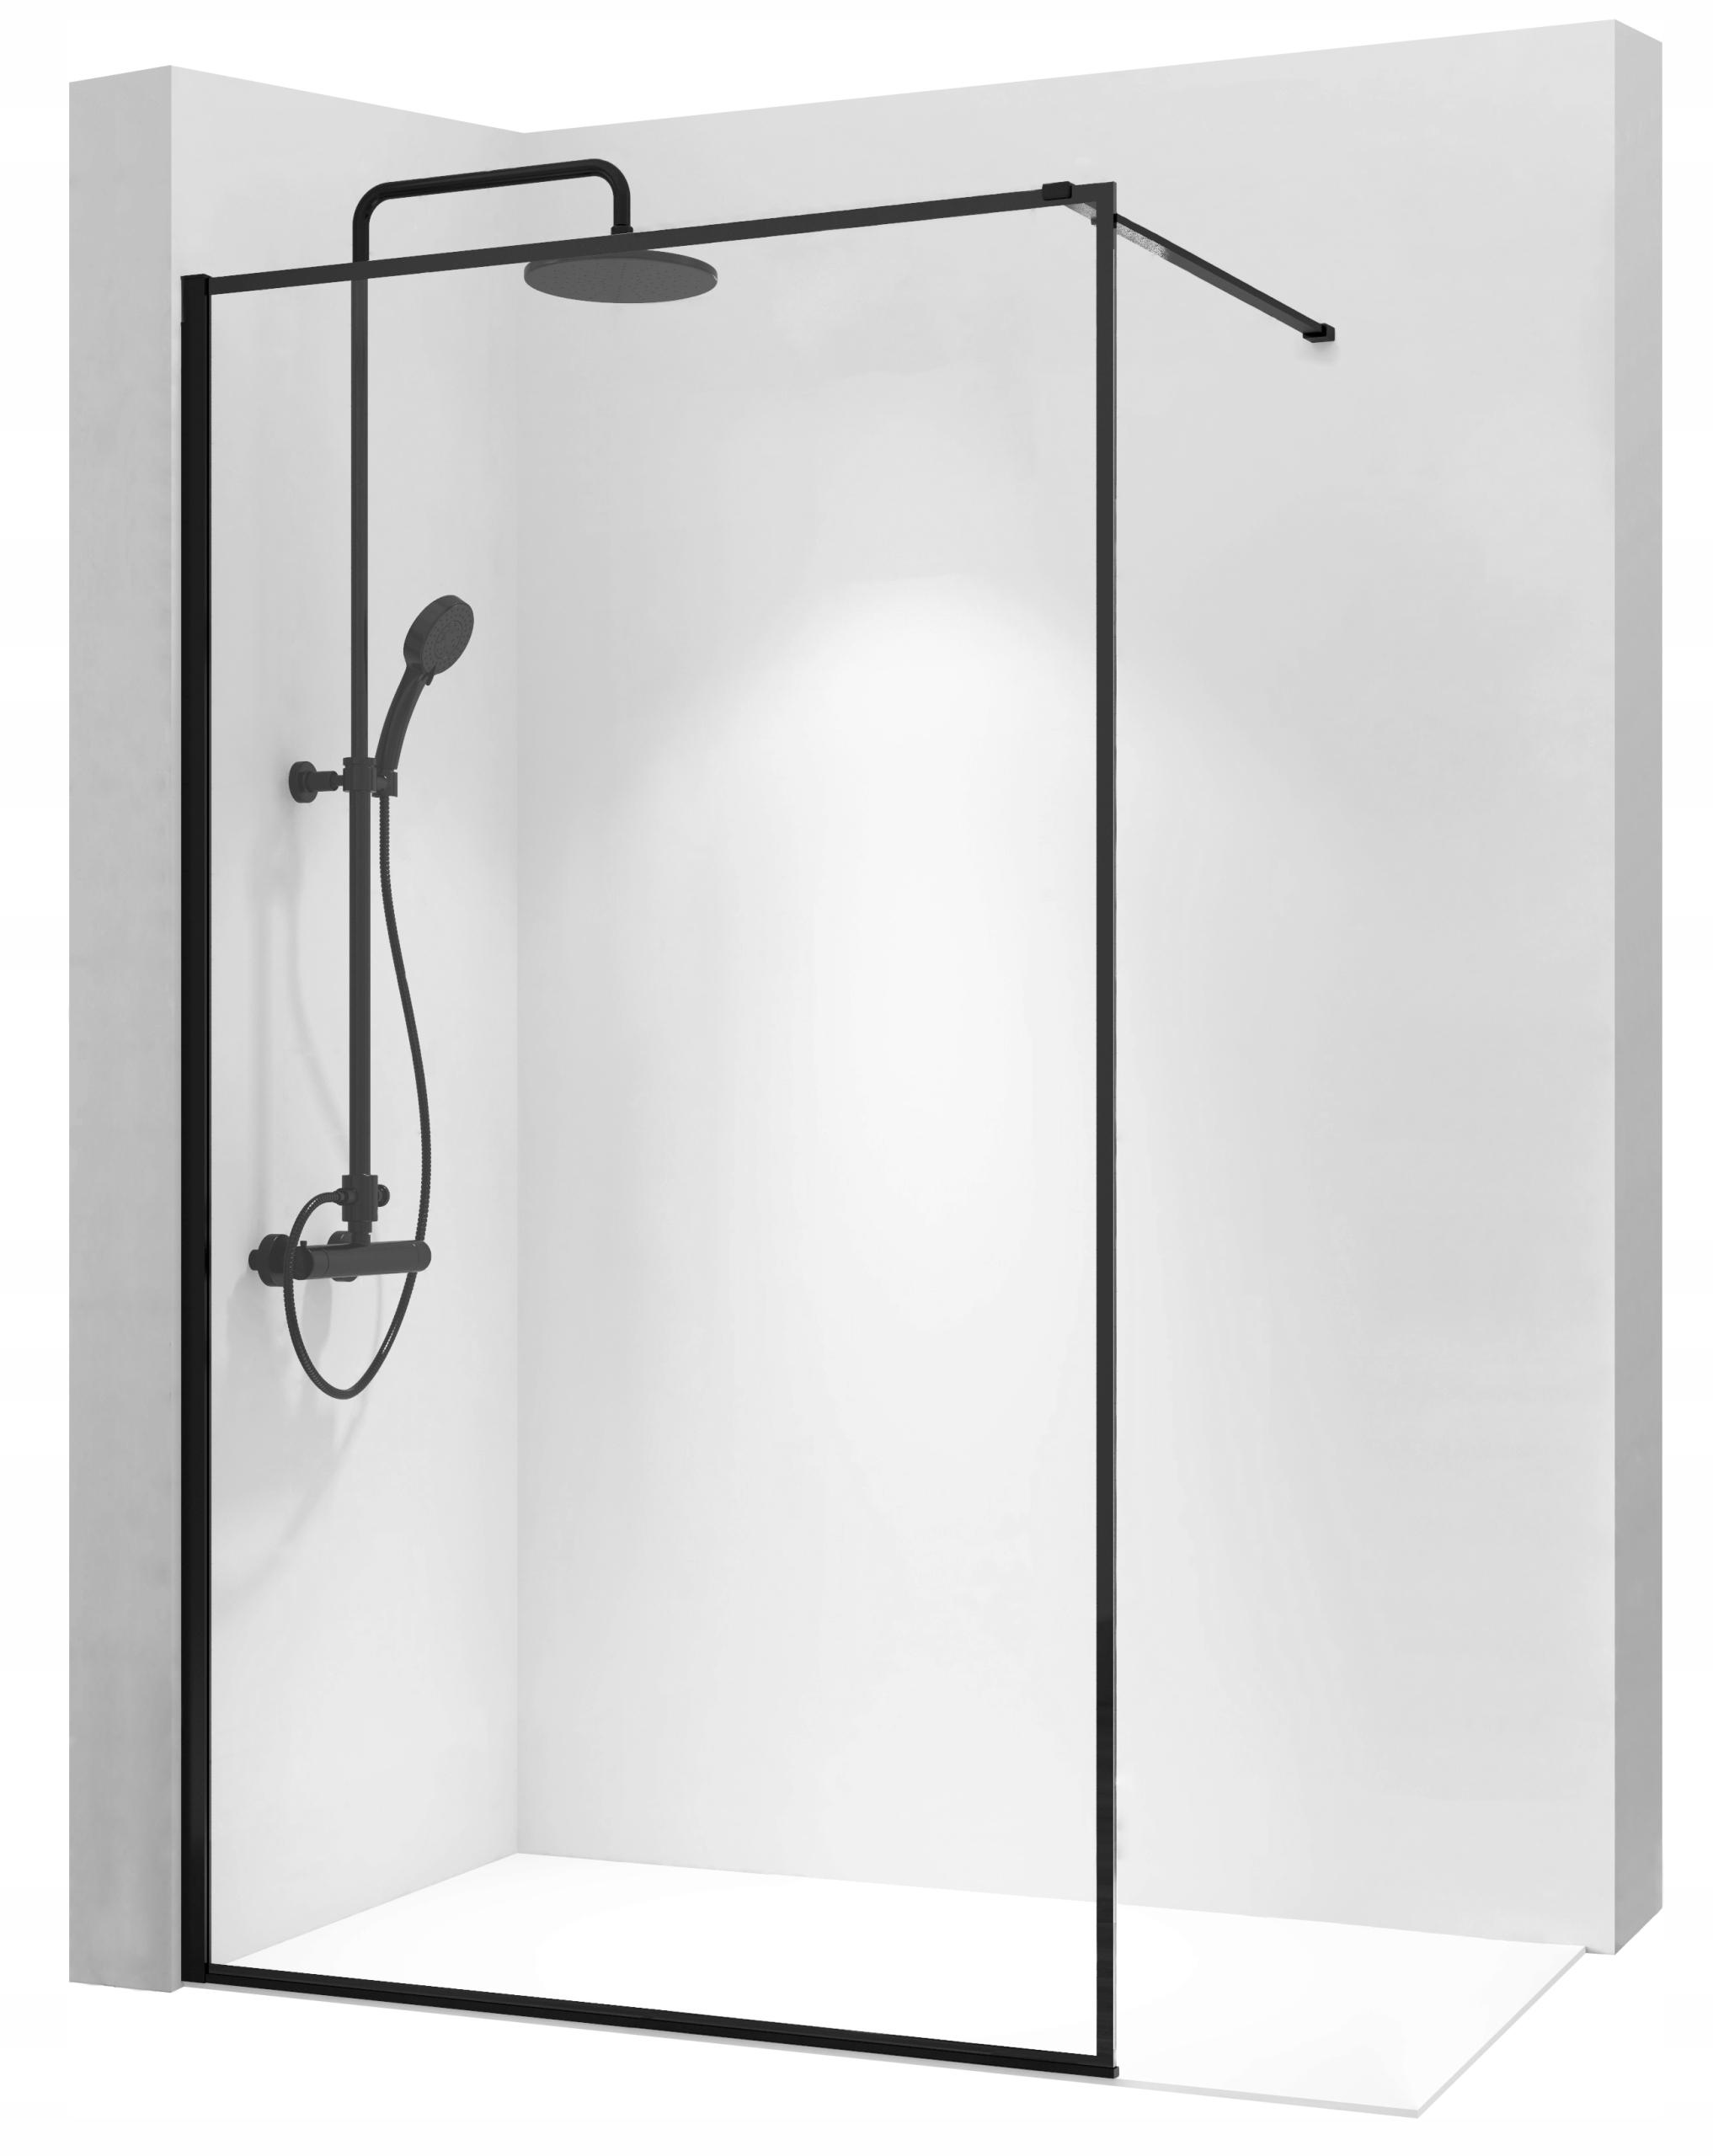 REA BLER90 WALK-IN 90 cm sprchová zástena čierna